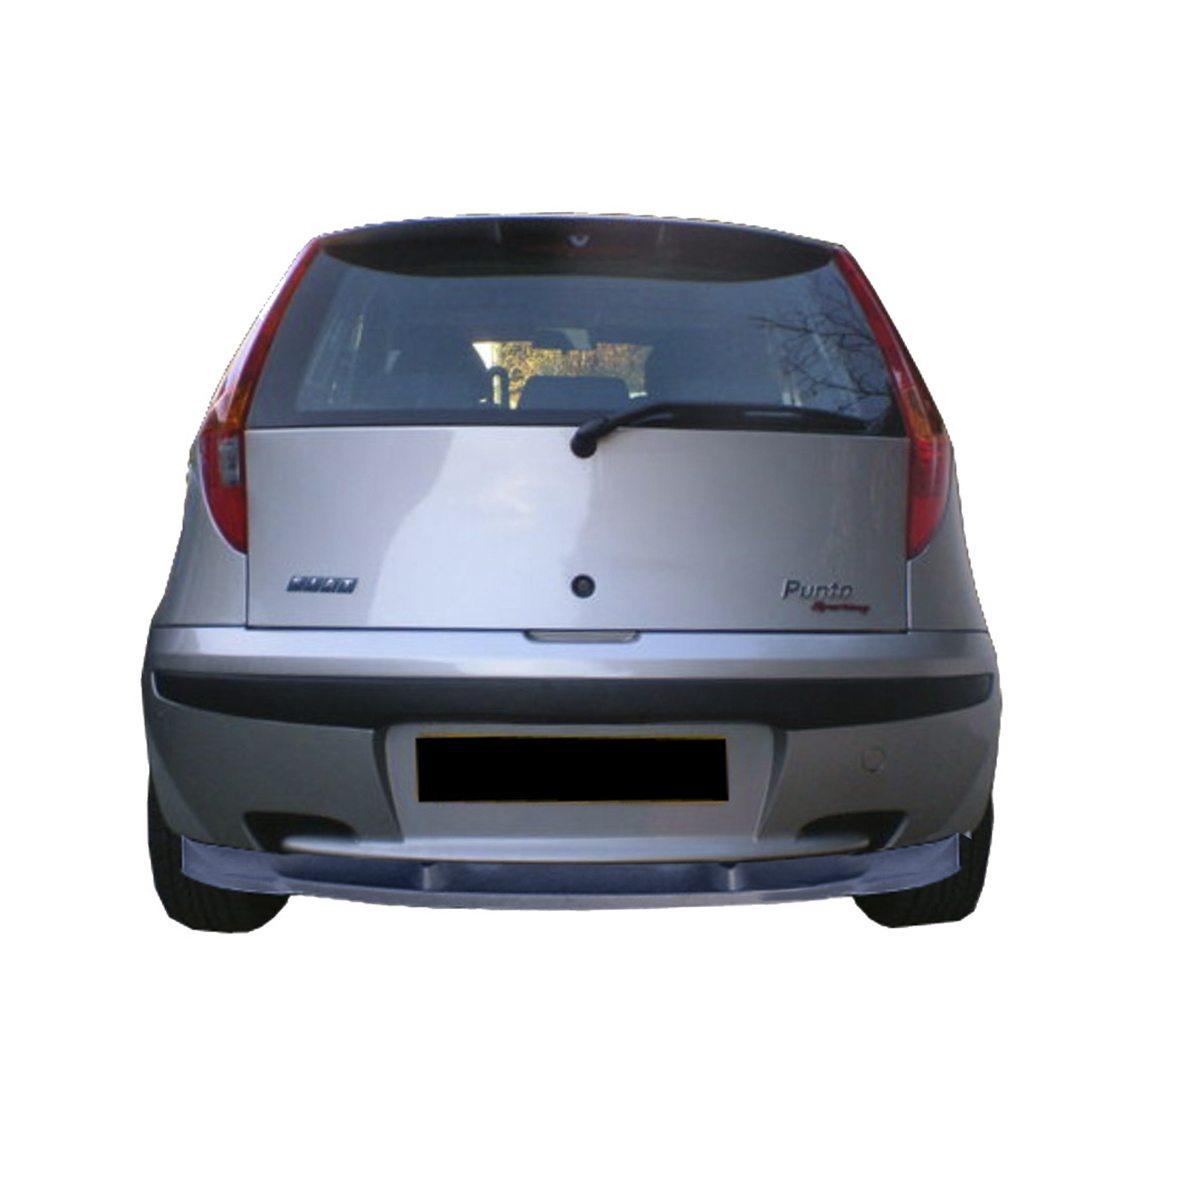 Fiat-Punto-00-Small-Tras-SPU0170